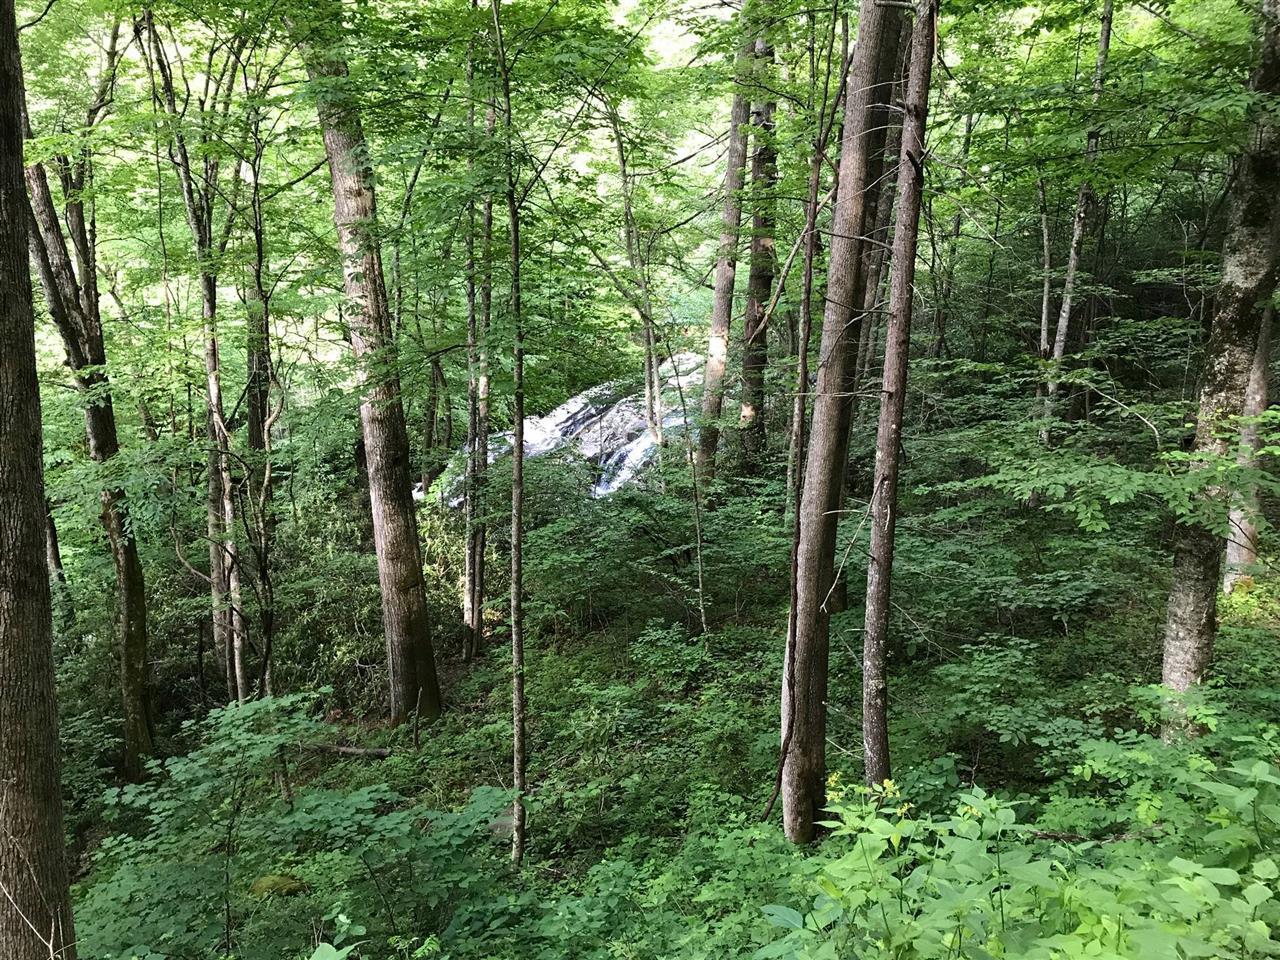 Nantahala National Forest in Graham County, NC